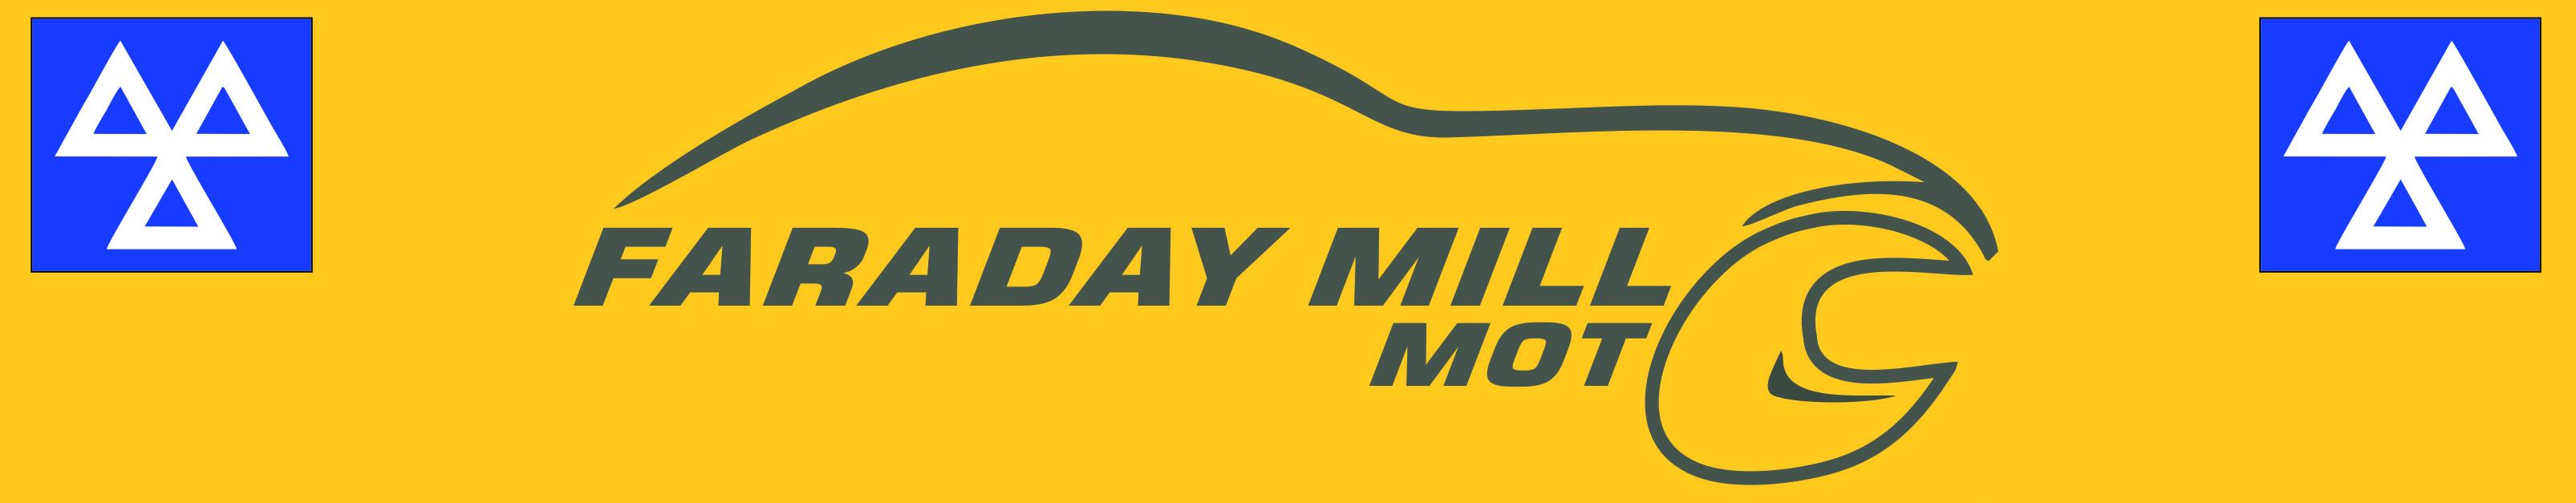 FARADAY MILL MOT - Booking Tool Logo